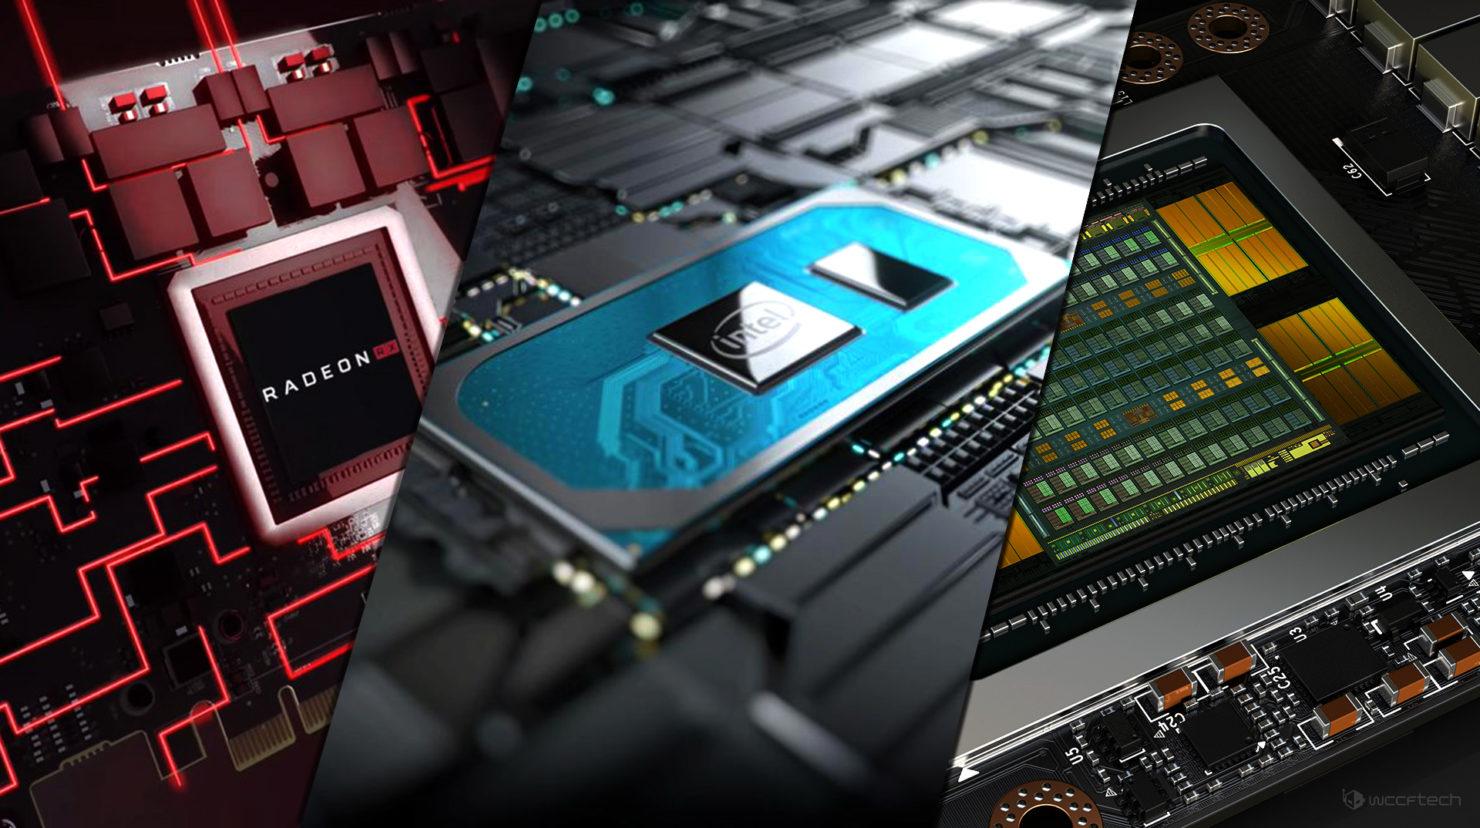 nvidia-&-intel-gpu-market-share-increased-while-amd-declined-in-q2-2021,-gpu-shipments-hit-37%-growth-year-over-year